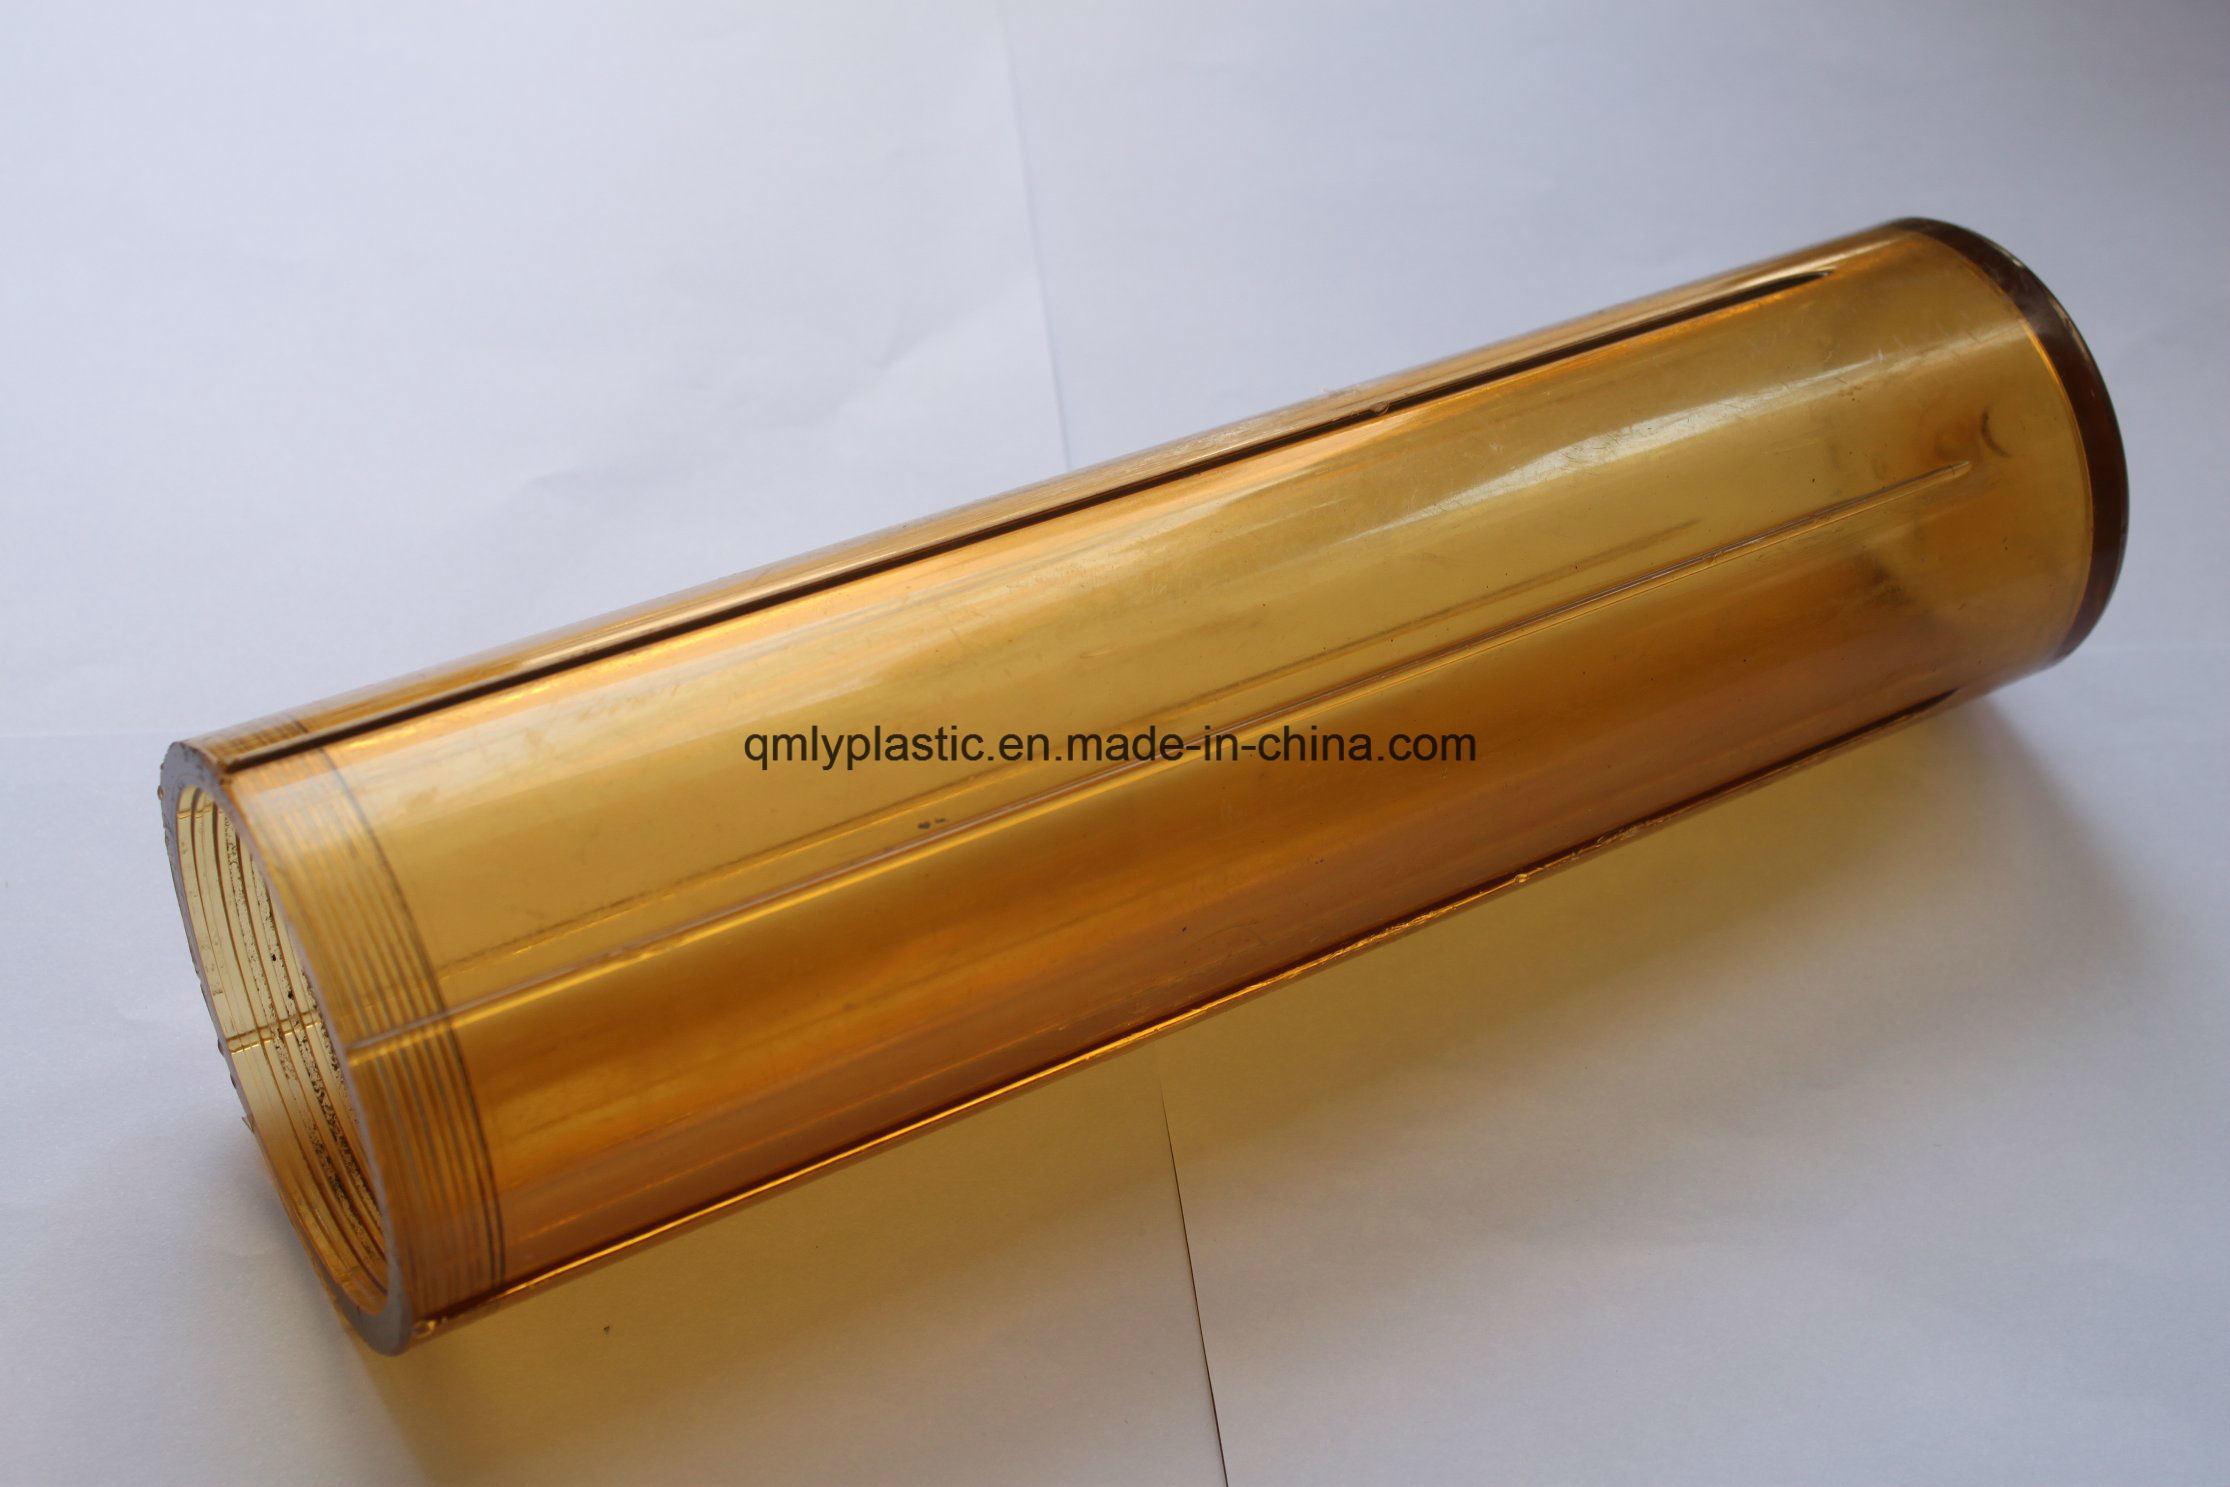 Hot Sales Engineering Plastic Granulas PSU (Polysulfon)